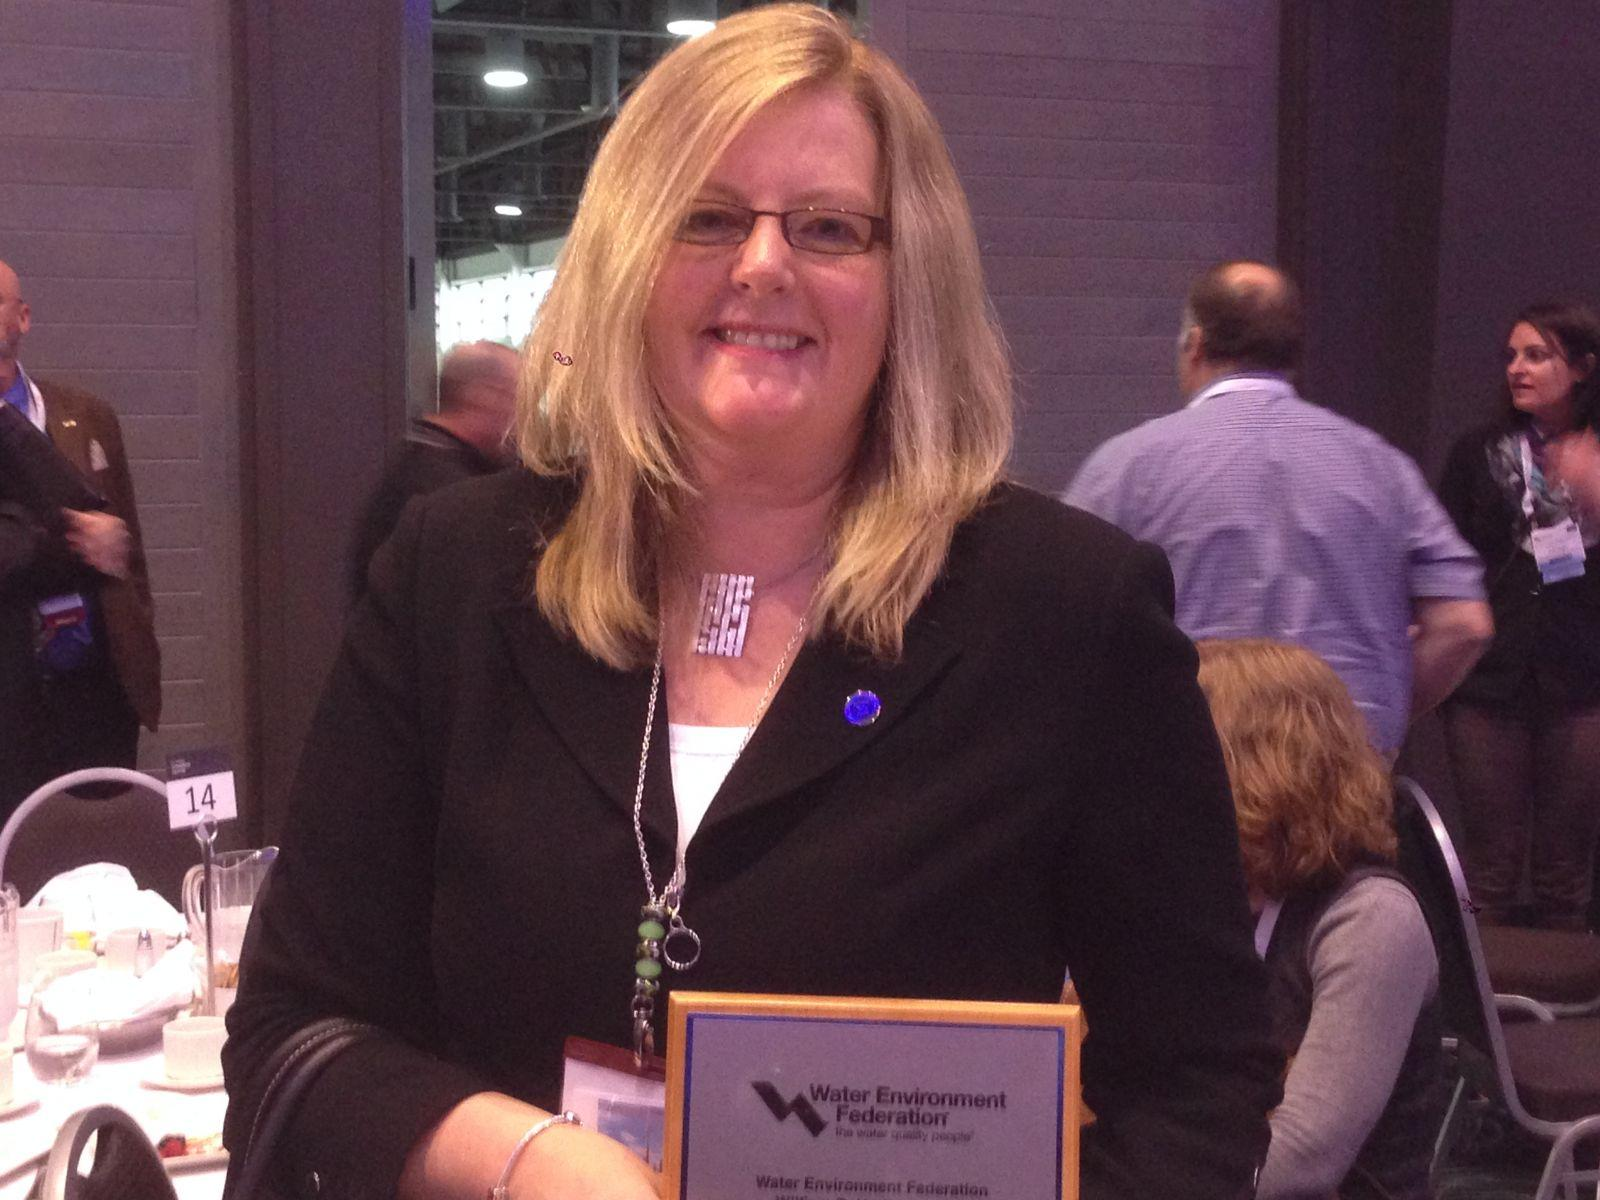 Bev Mollard Poses with the Hatfield Award